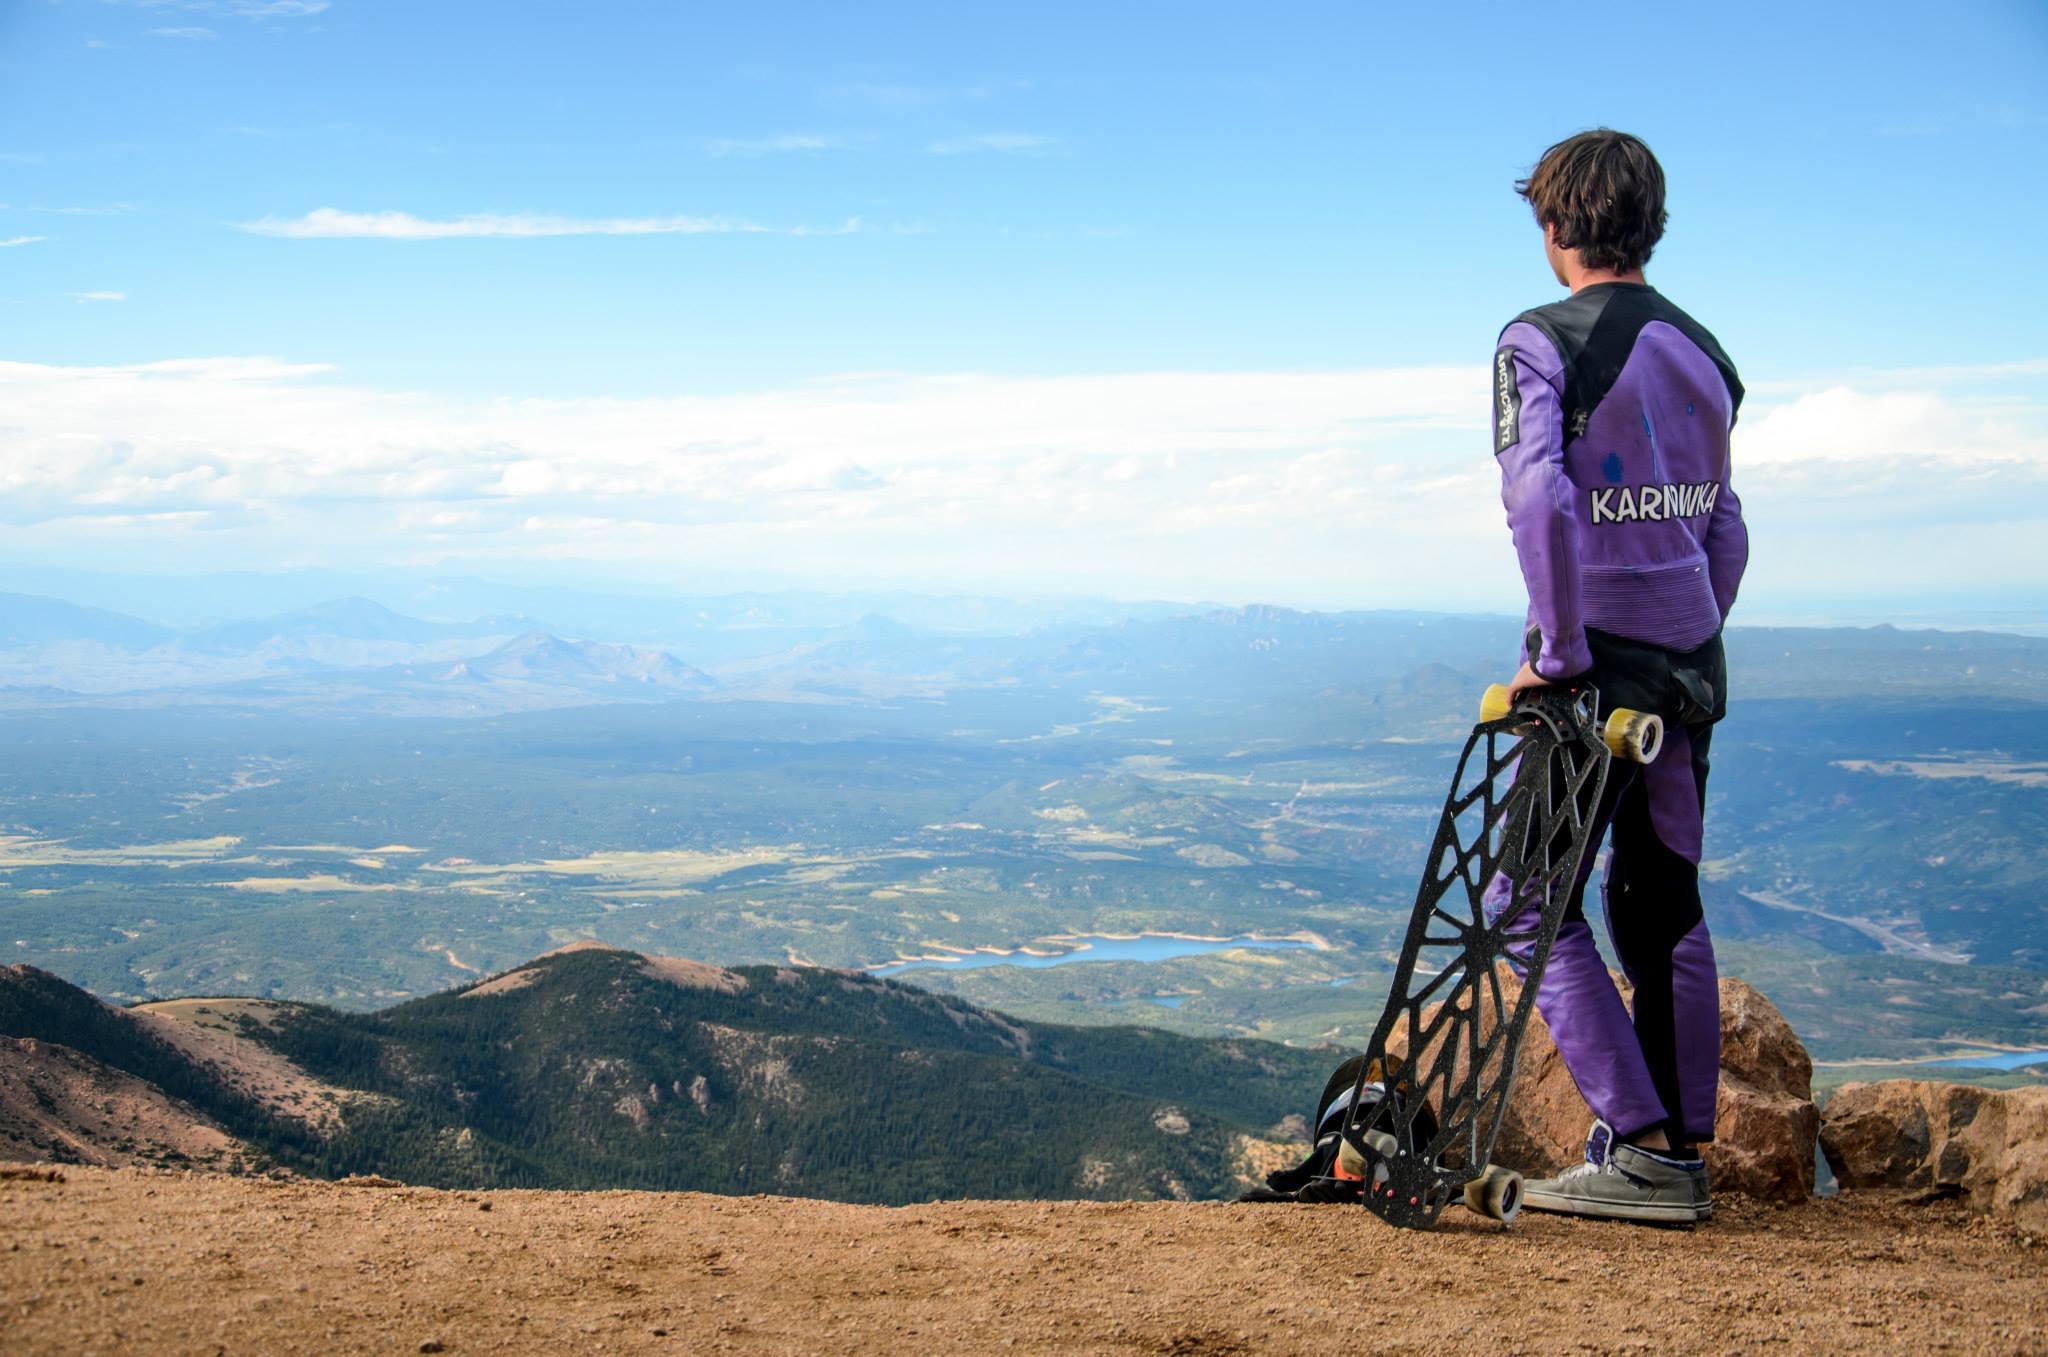 Andrew Karnowka Pikes Peak